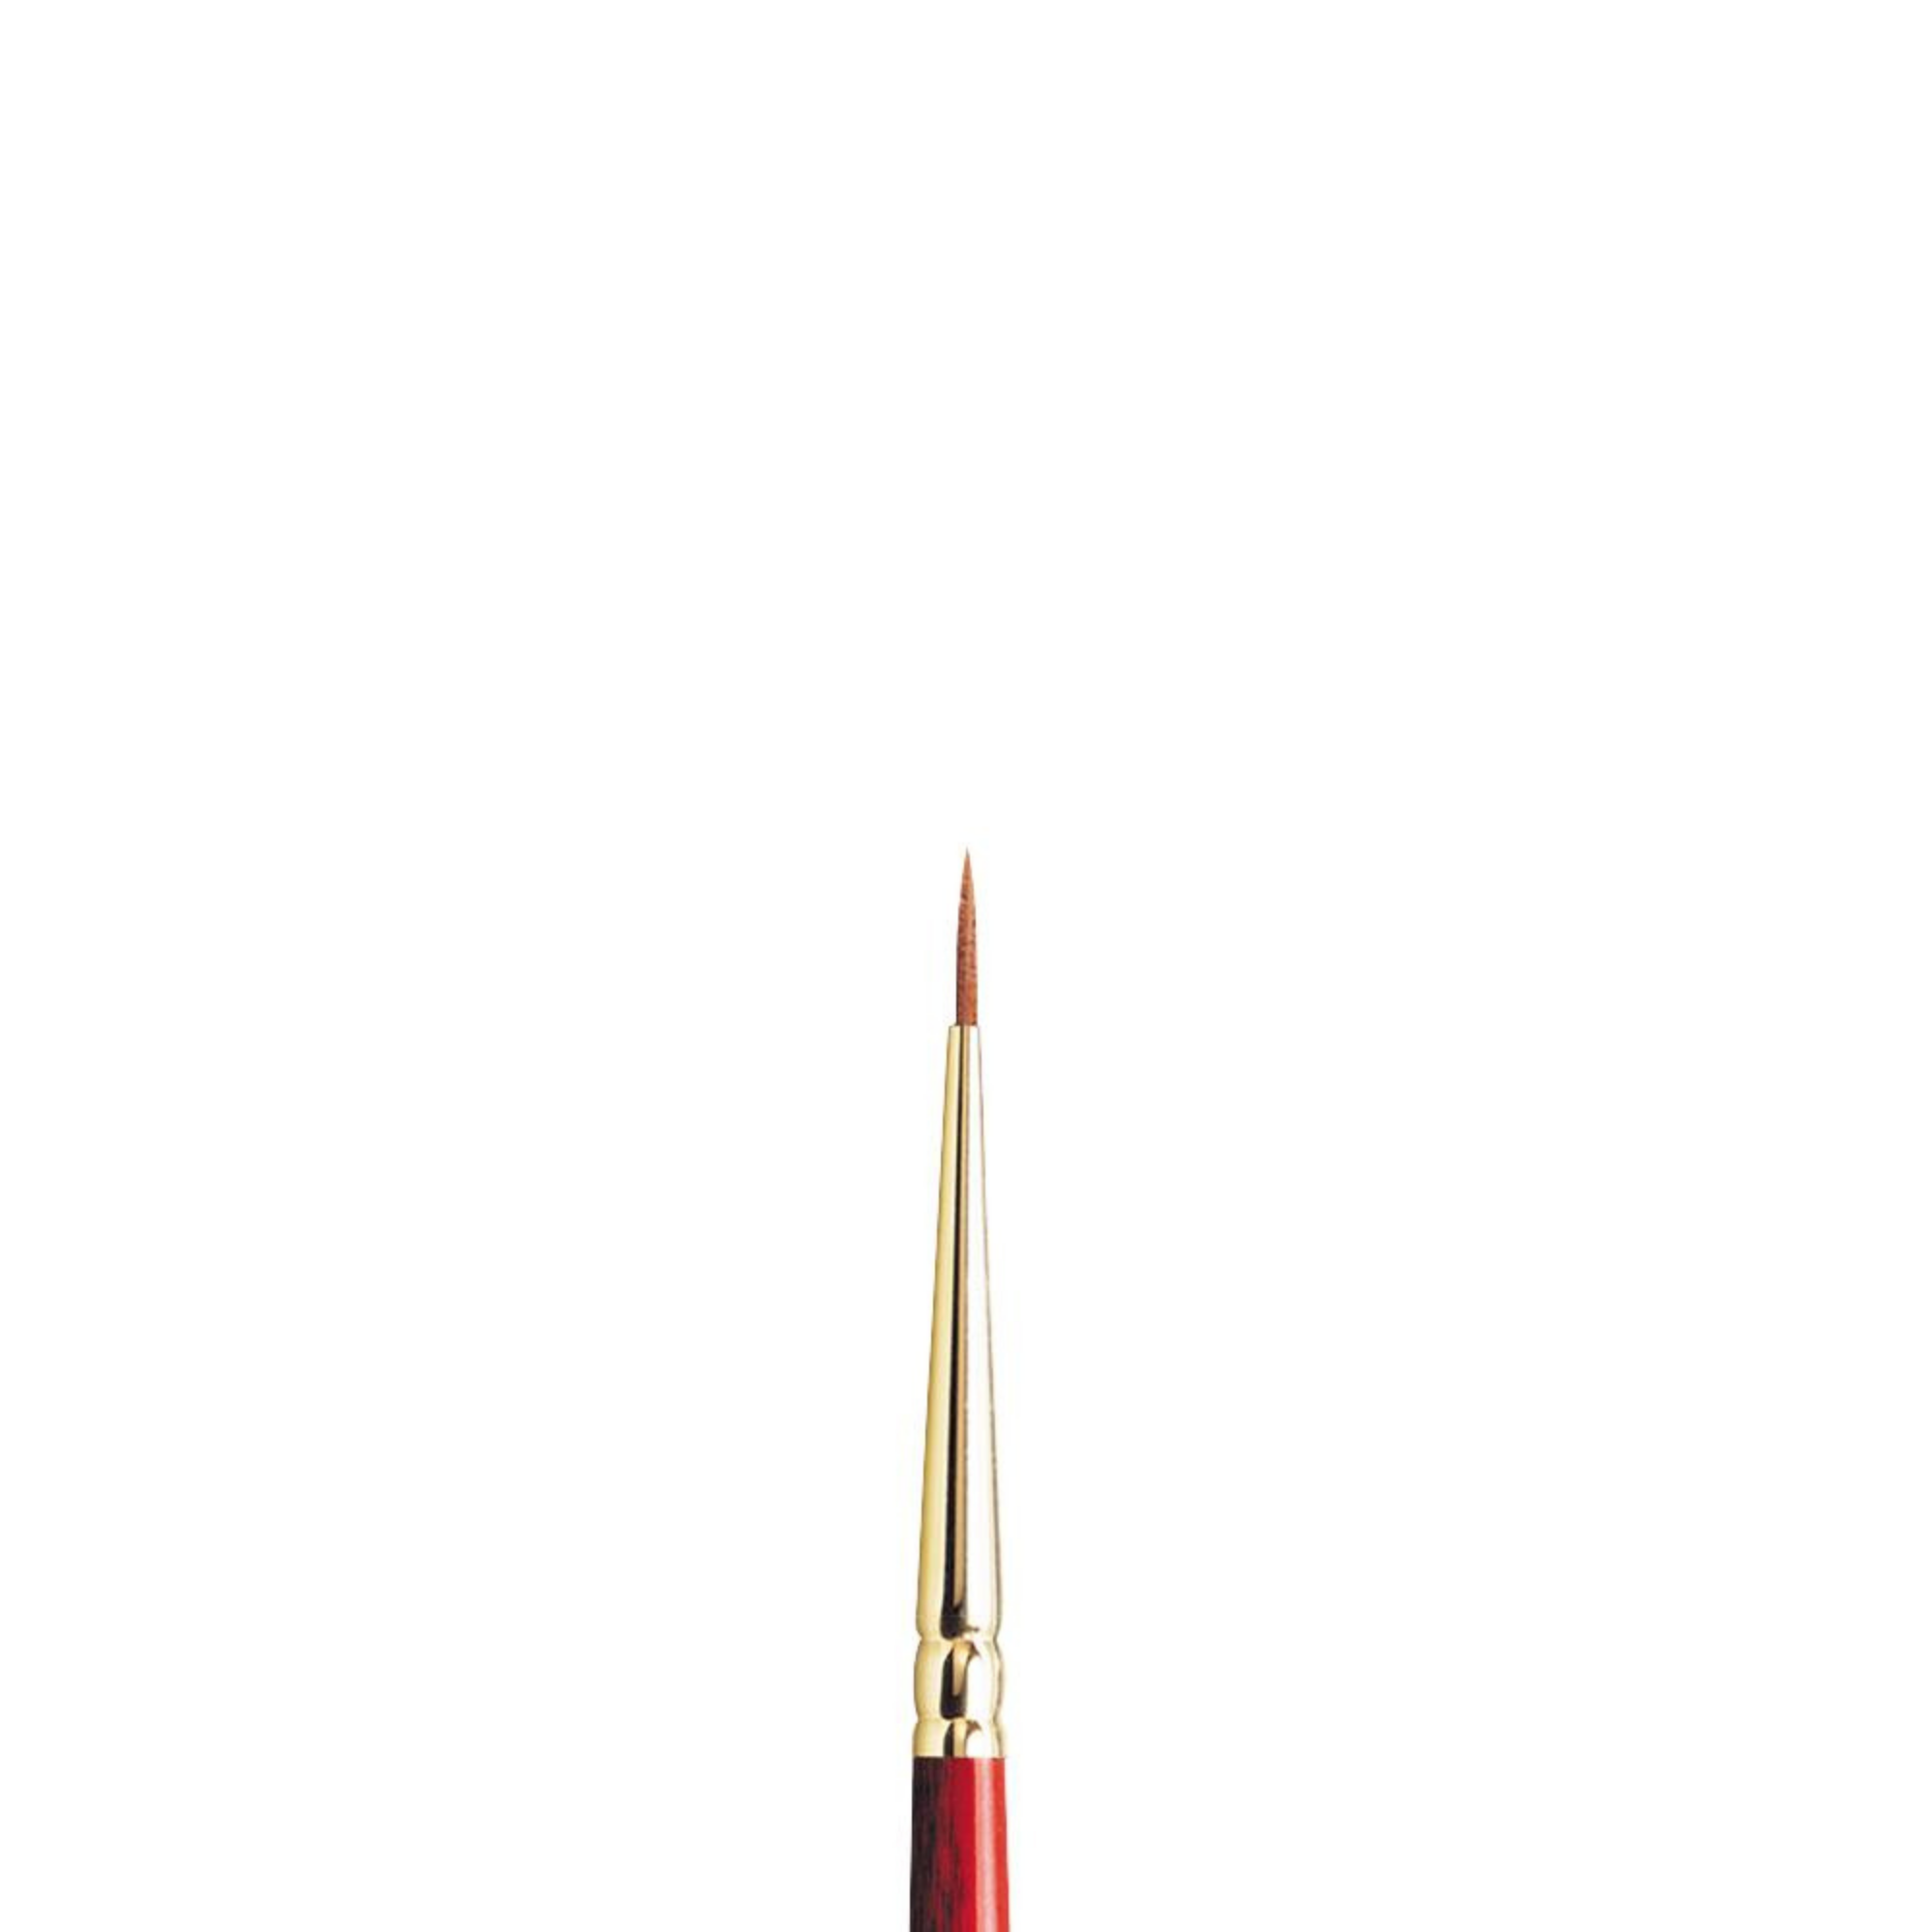 PINCEL WN RED/MARTA-NYLON SCEPTRE GOLD II #00